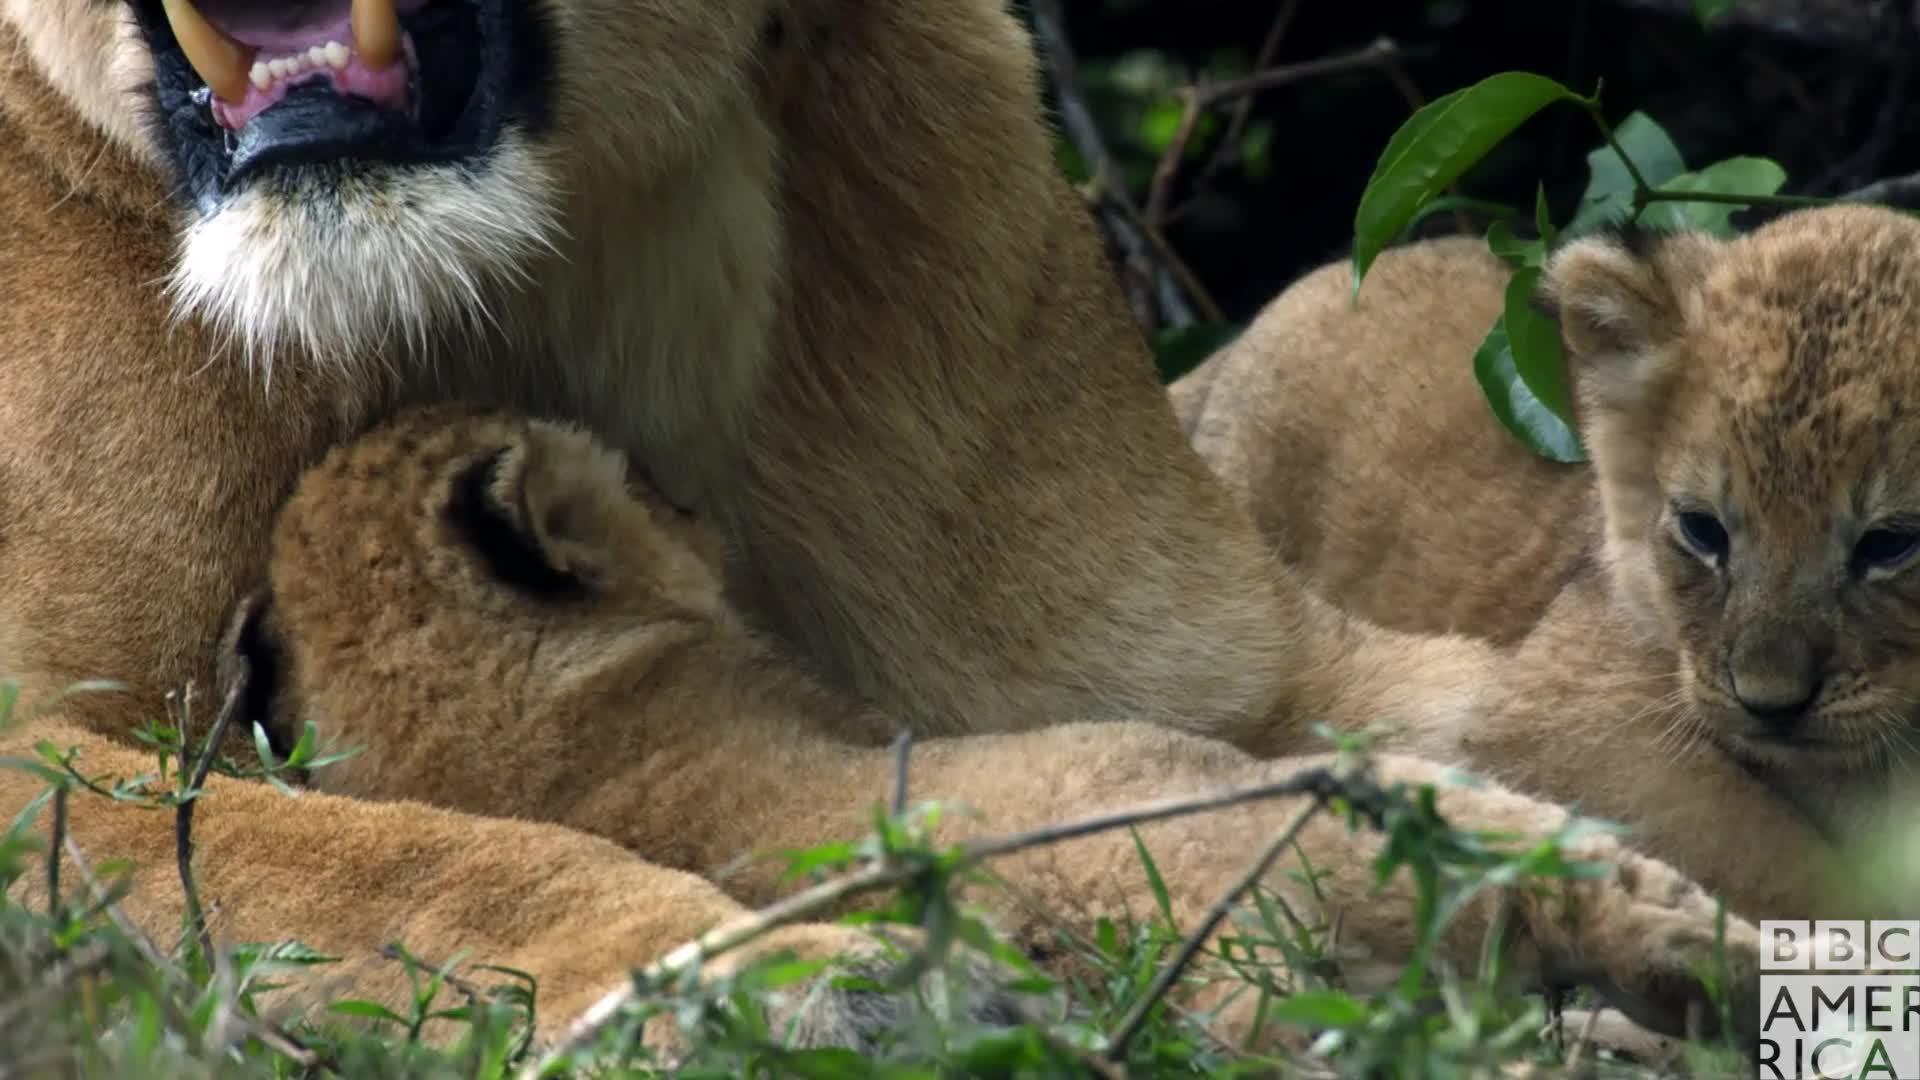 animal, animals, awww, bbc america, bbc america: dynasties, dynasties, hug, hugs, lion, lions, love, Dynasties Lion Cub Hug GIFs